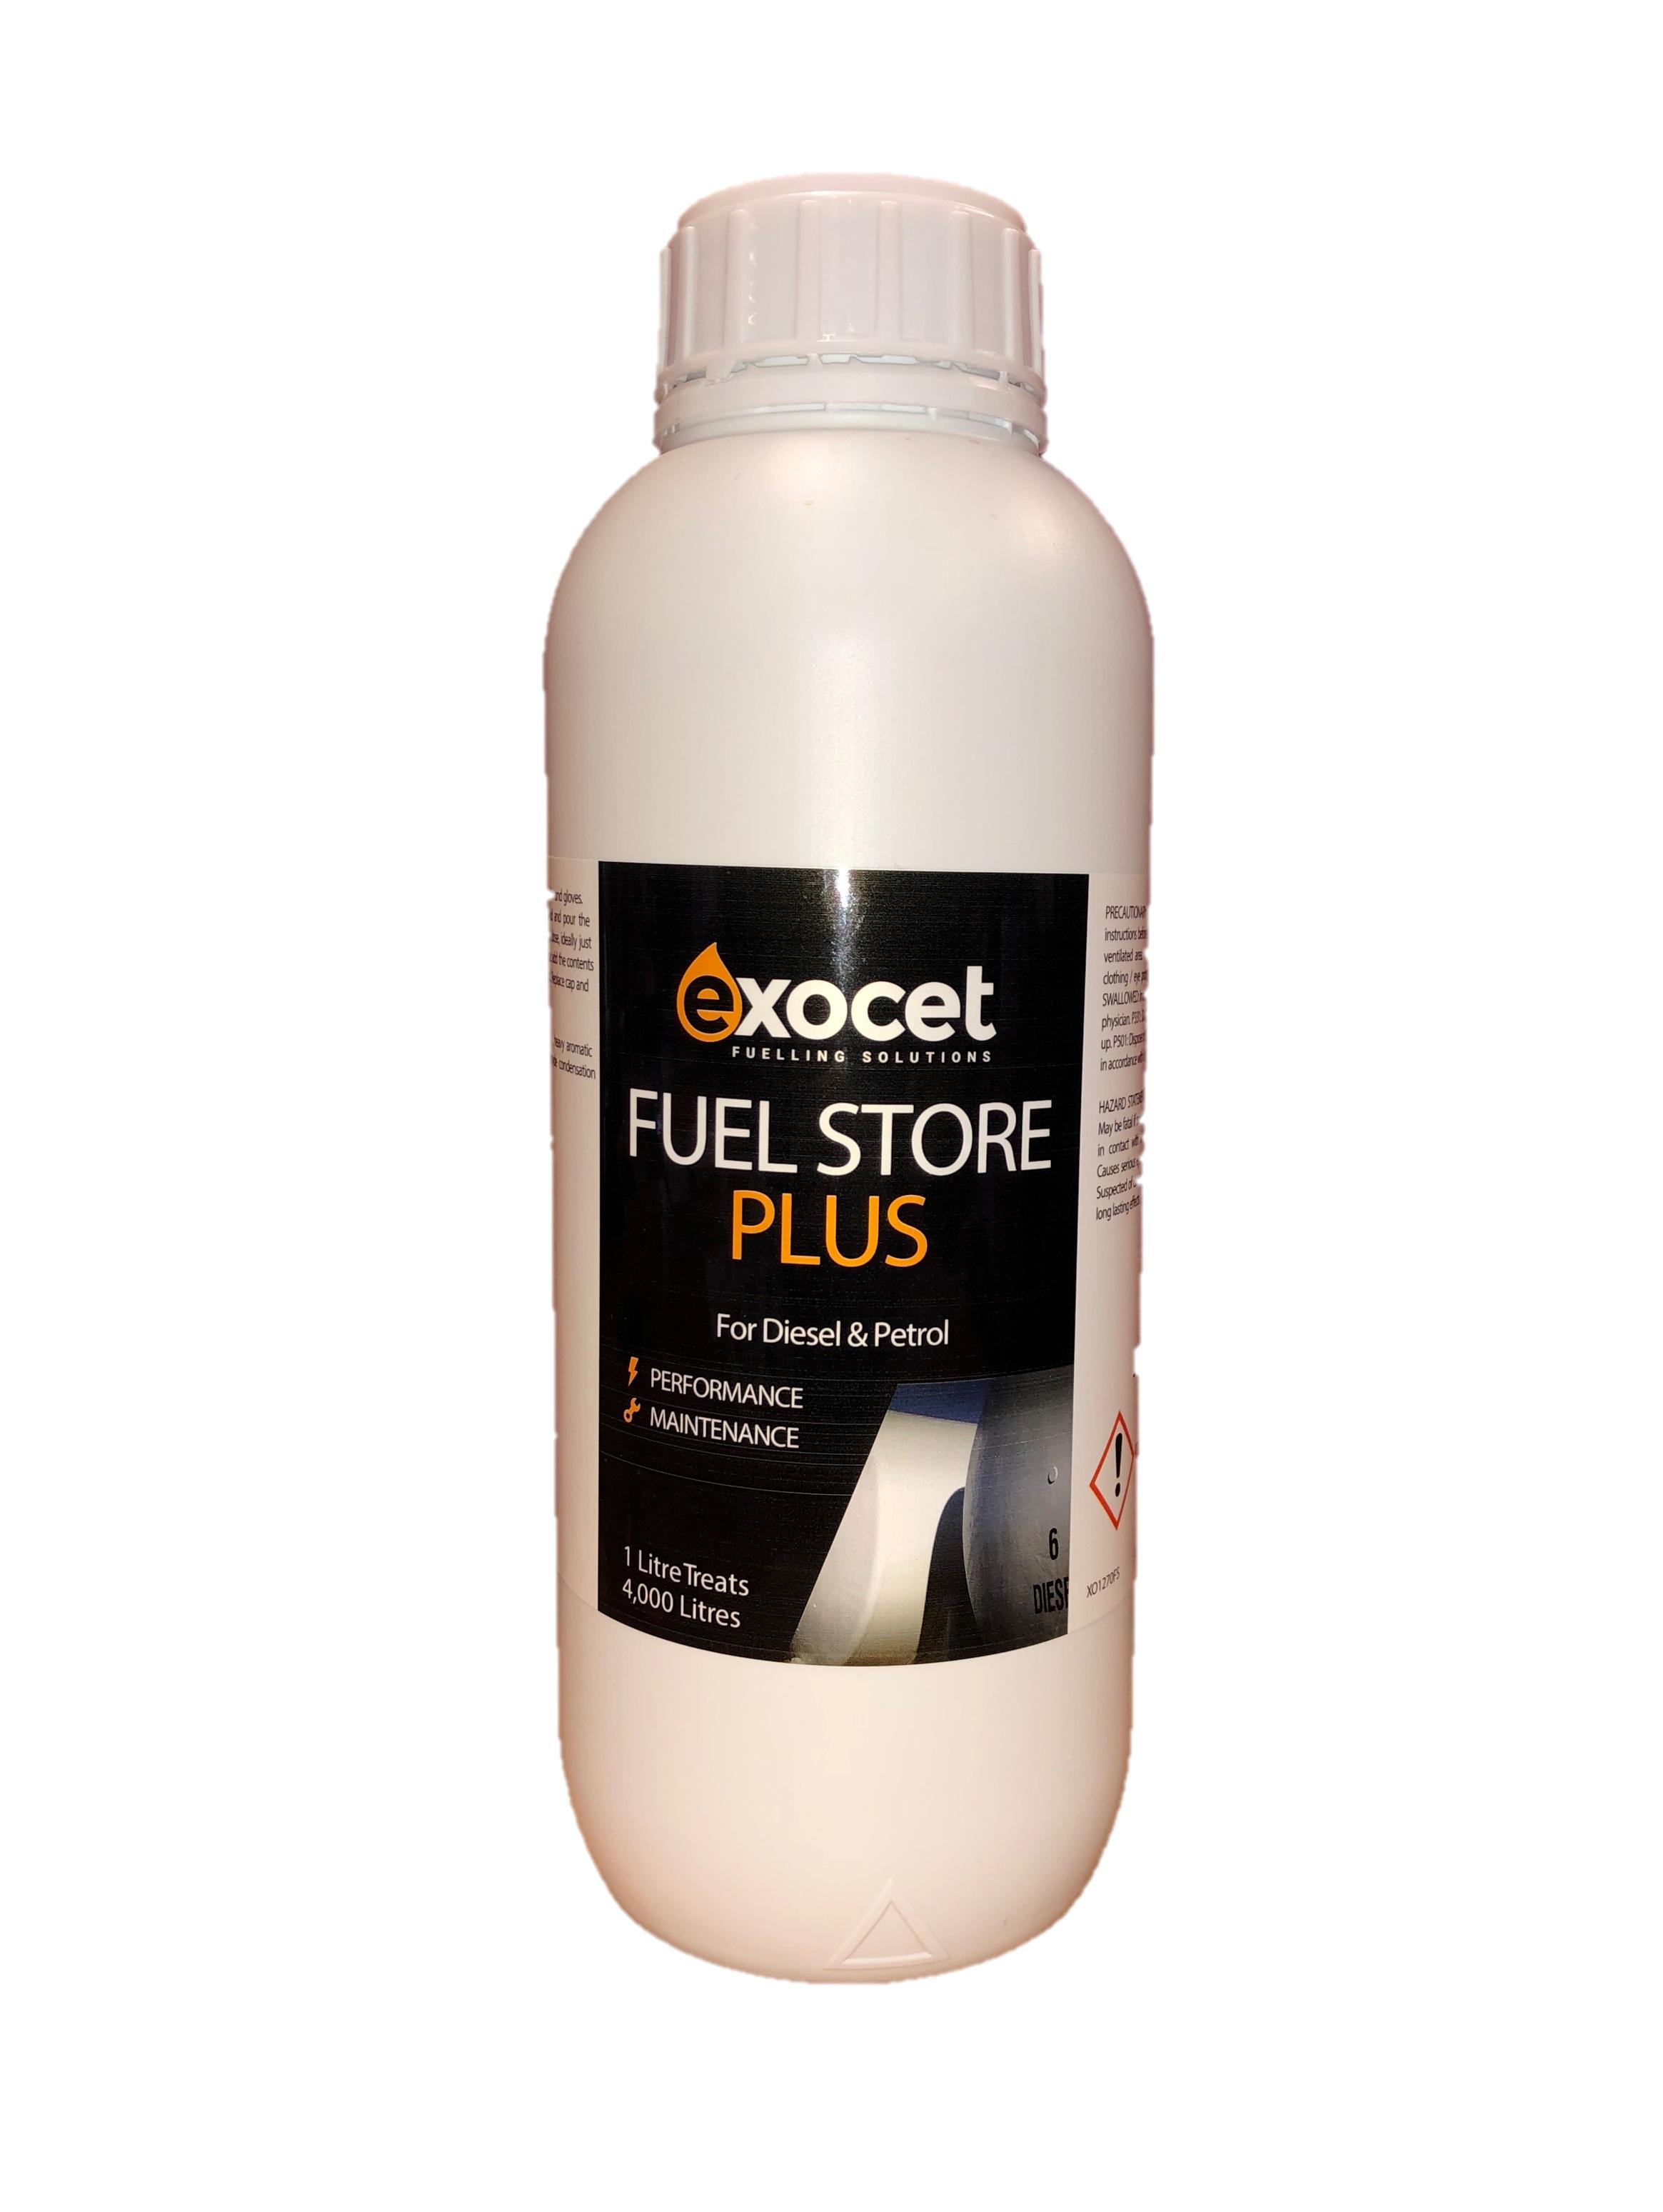 Fuel+store+plus.jpg